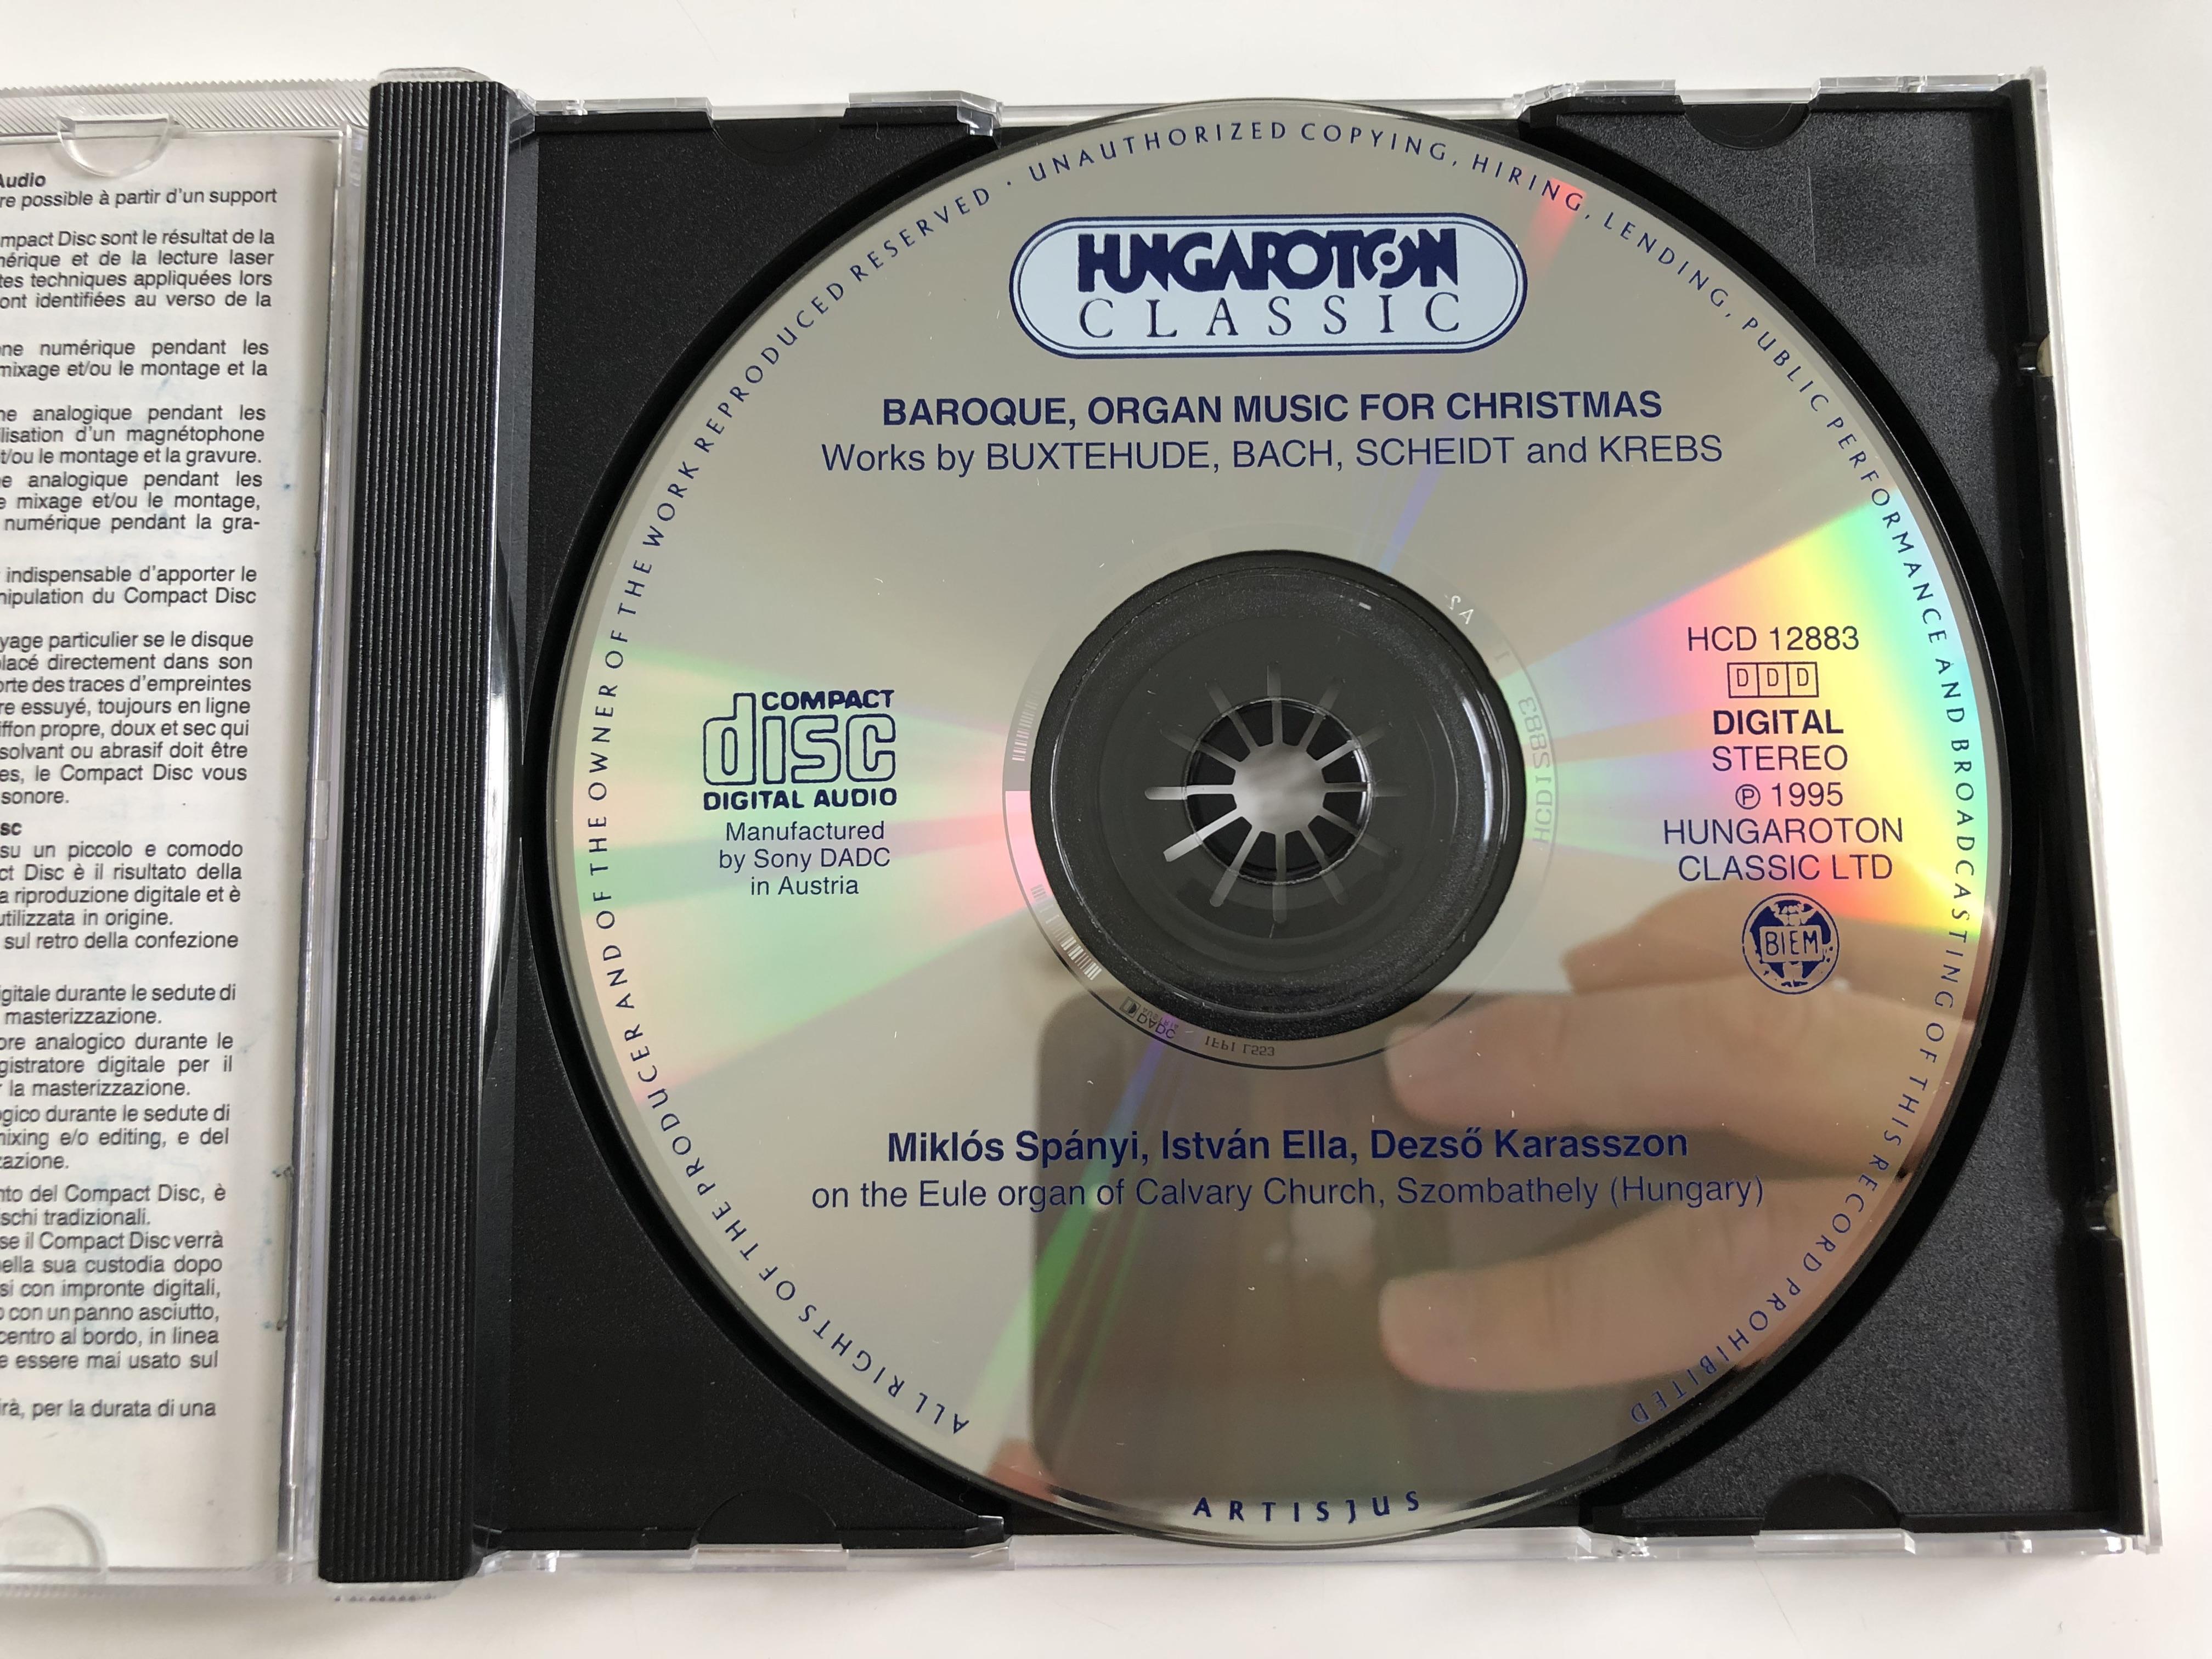 baroque-organ-music-for-christmas-bach-buxtehude-scheidt-krebs-miklos-spanyi-istv-n-ella-dezs-karasszon-hungaroton-audio-cd-1995-stereo-hcd-12883-6-.jpg